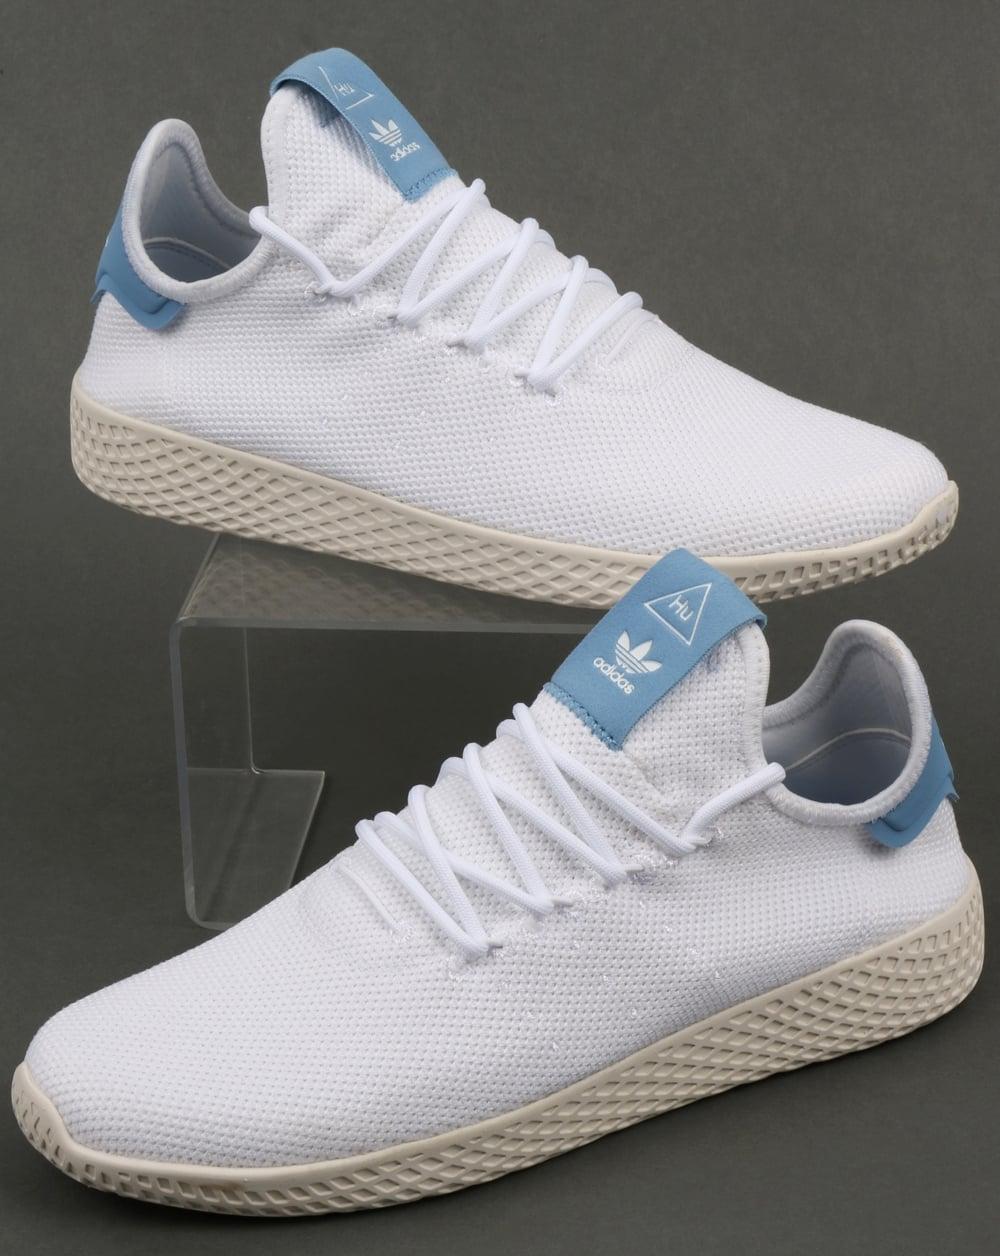 770df30792af Adidas PW Tennis HU Trainers White Sky Blue